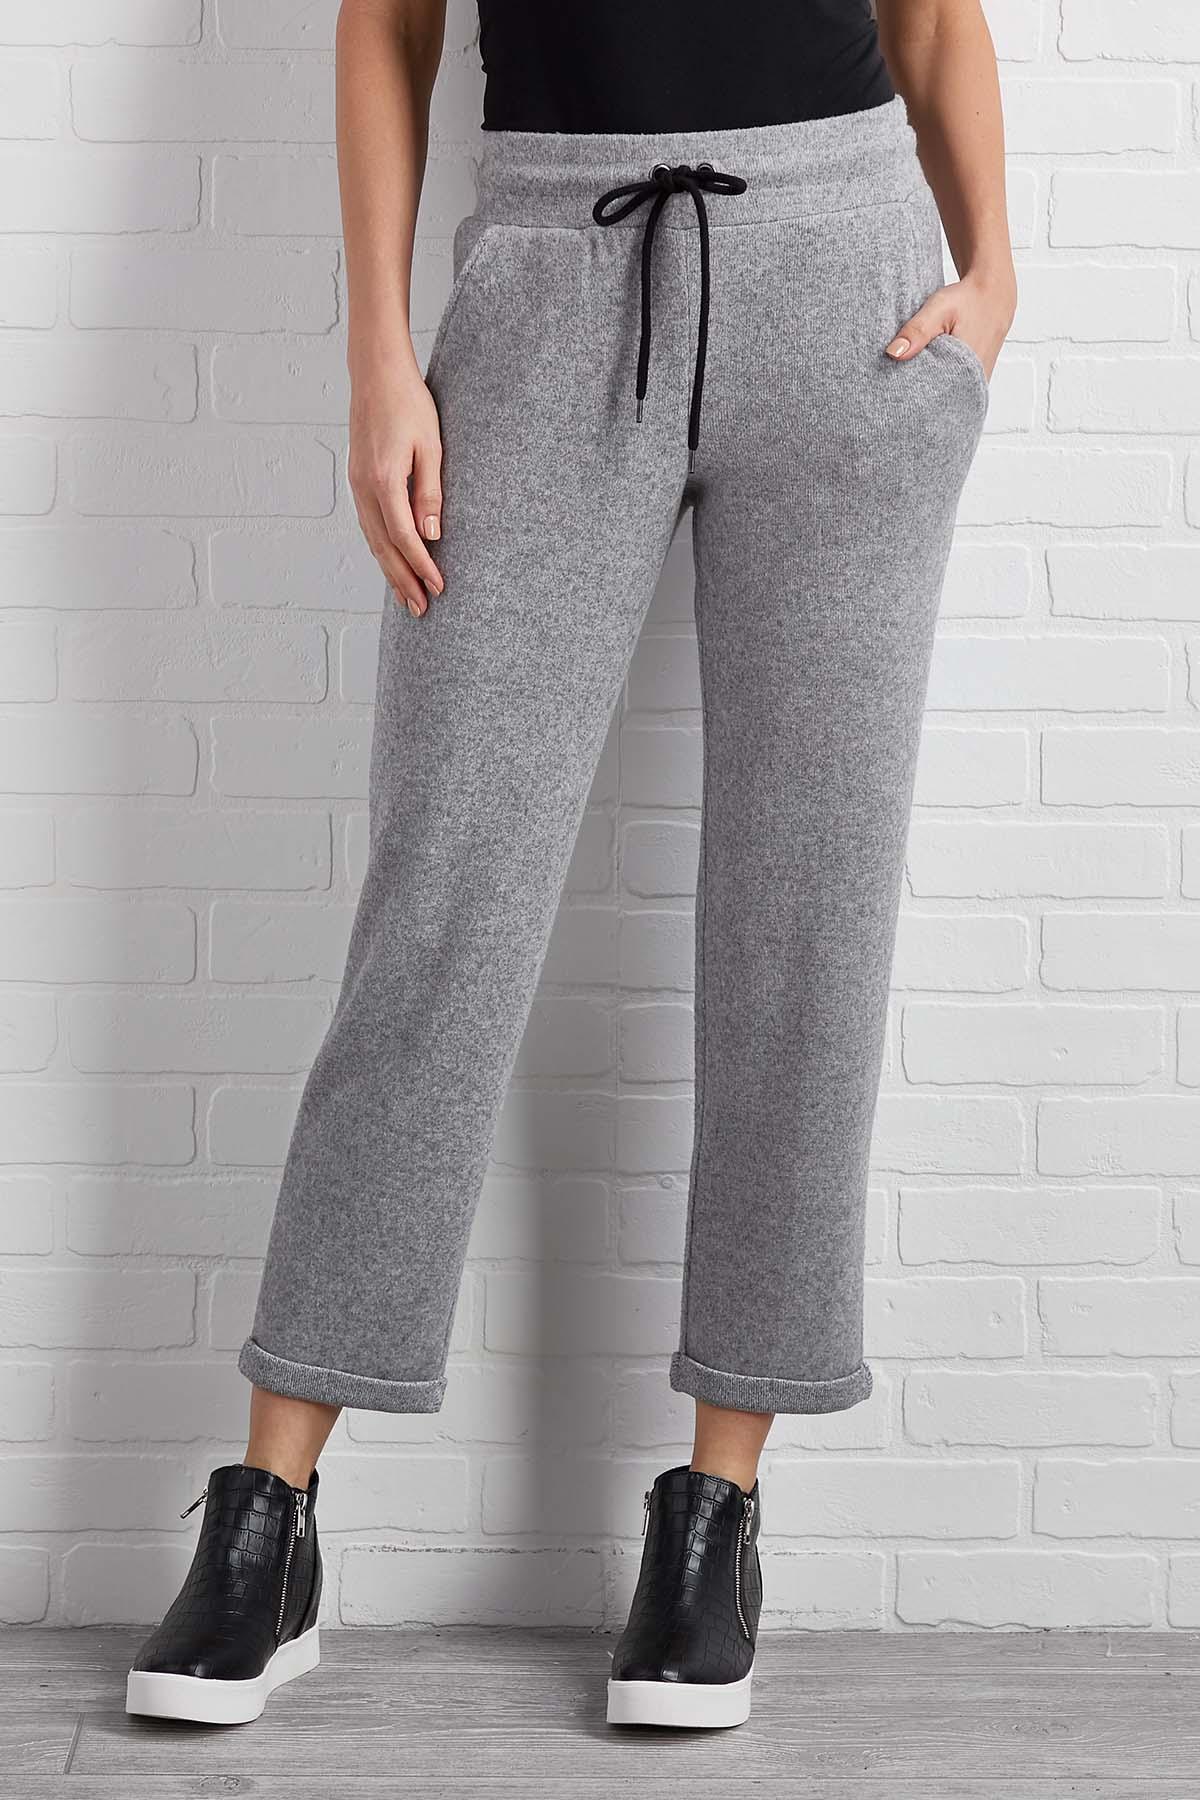 Saturday Morning Lounge Pants